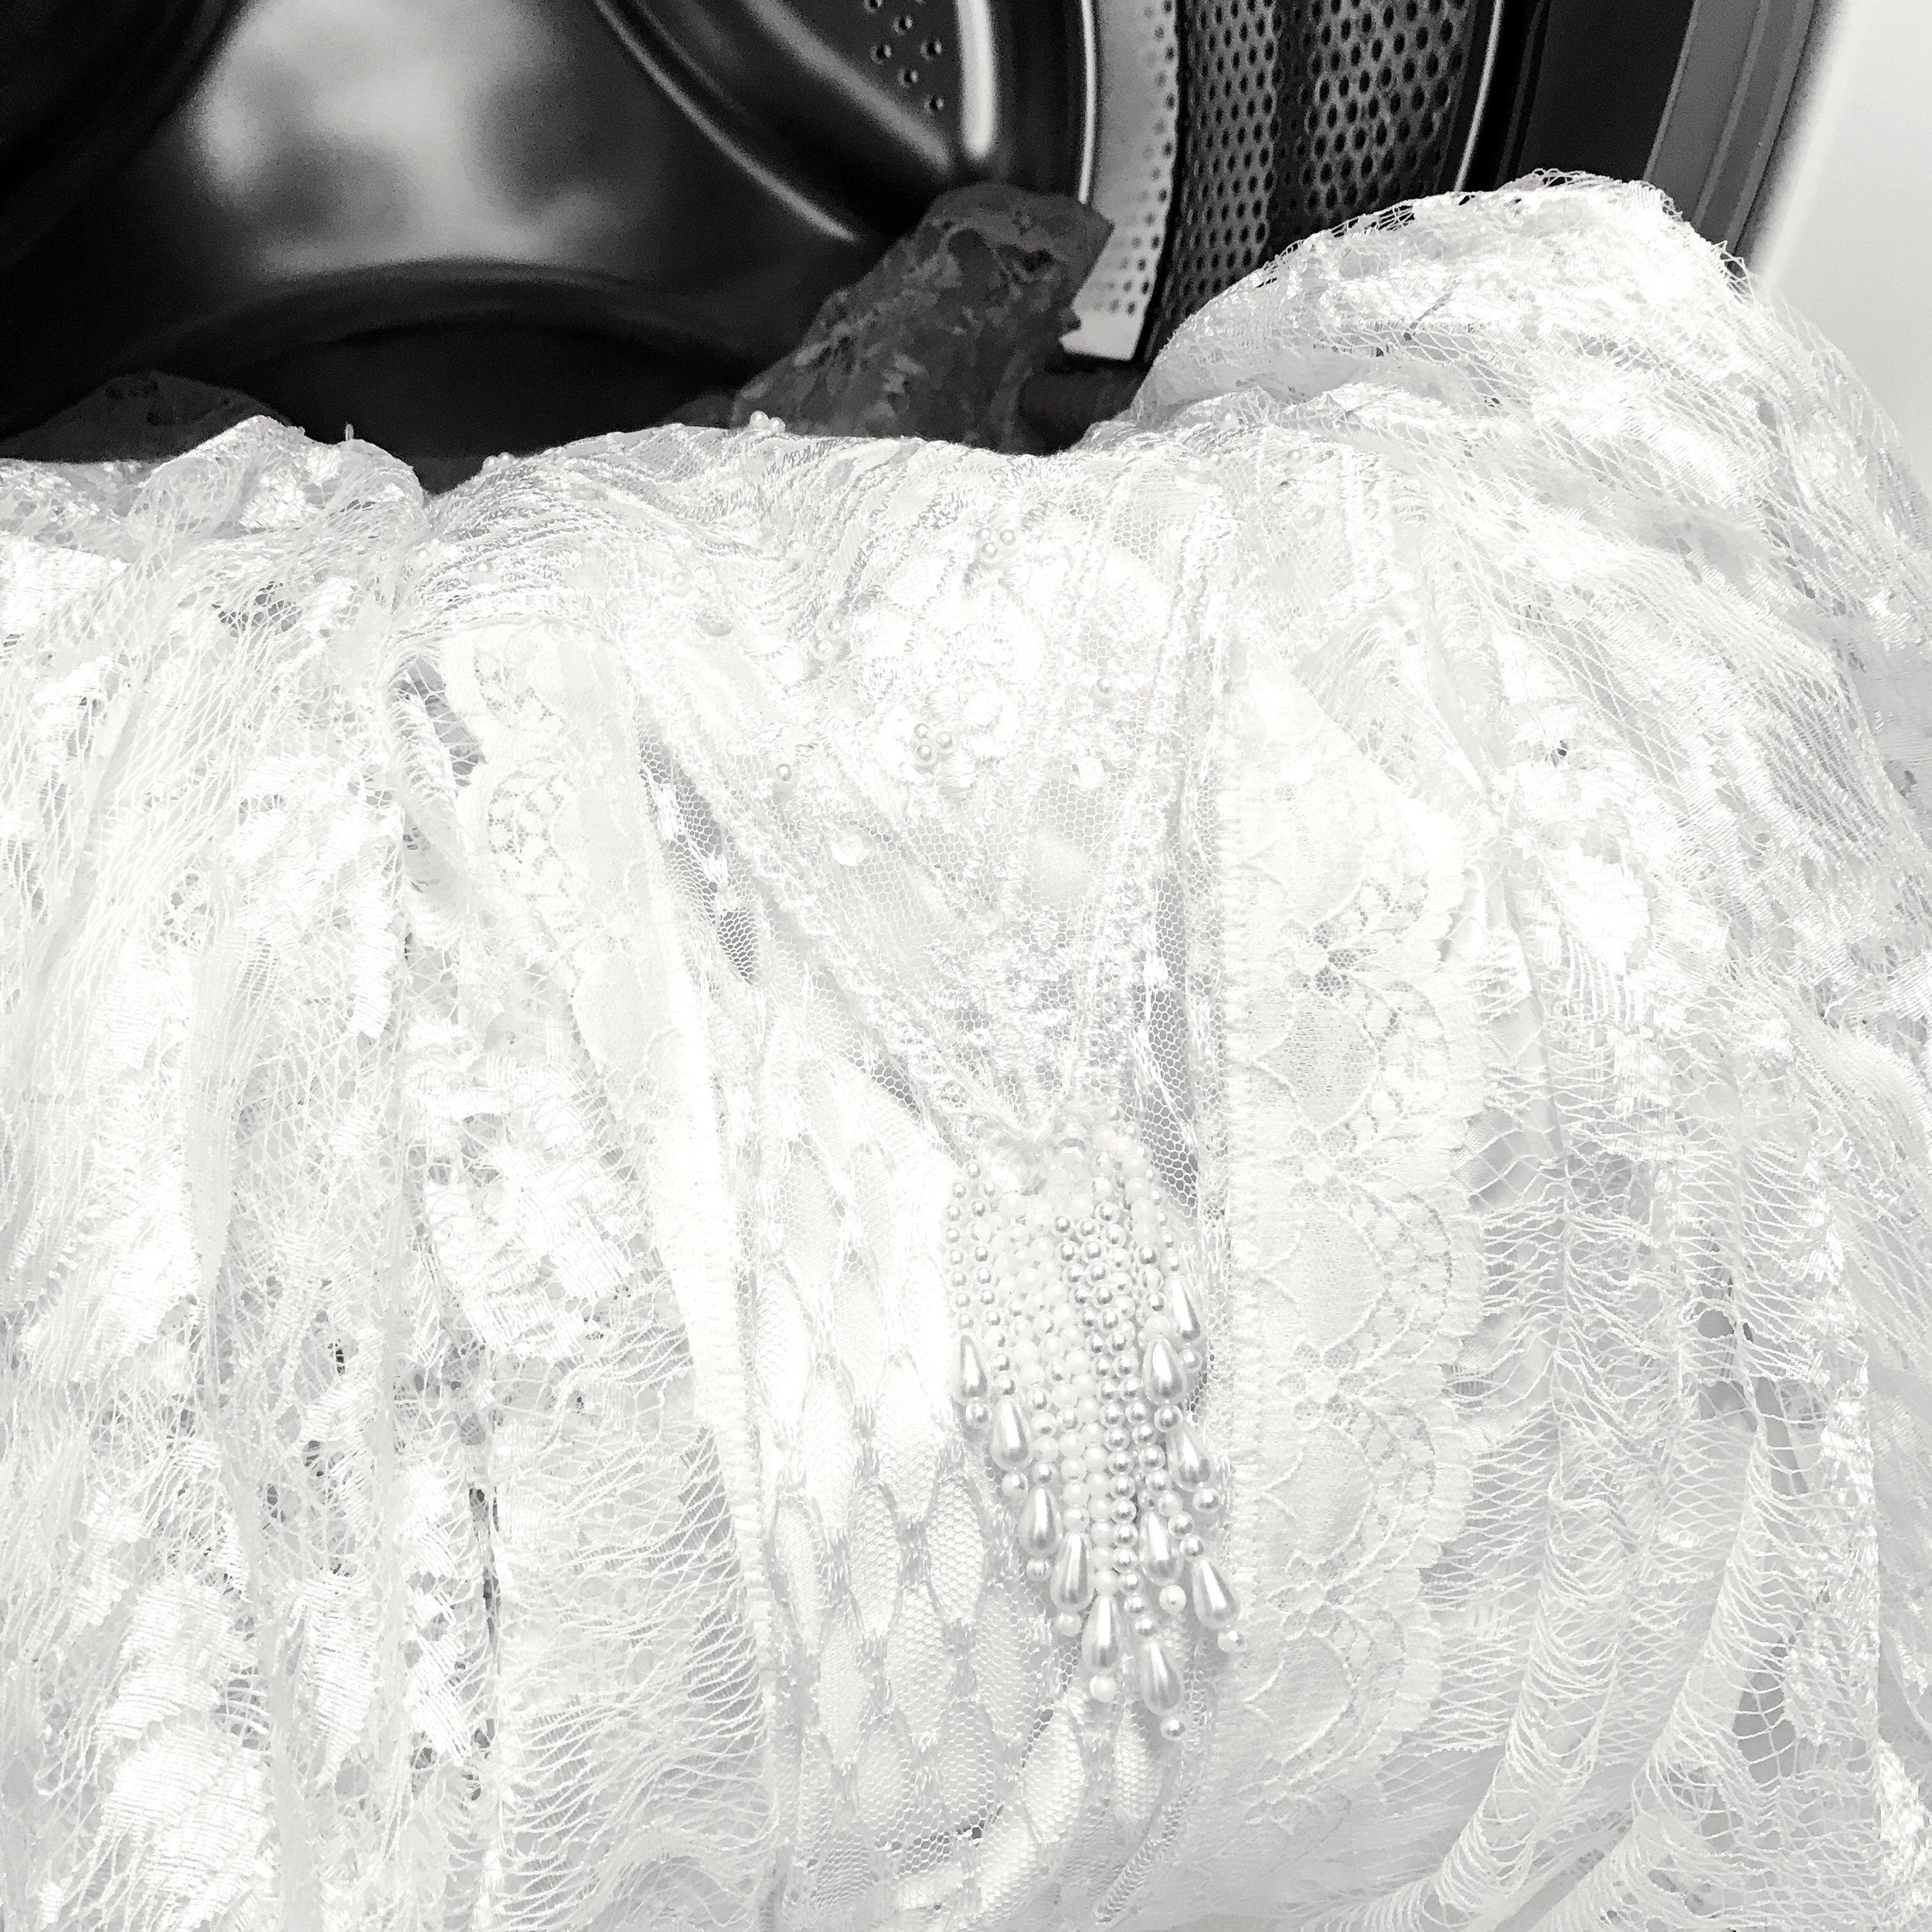 Washing the dress